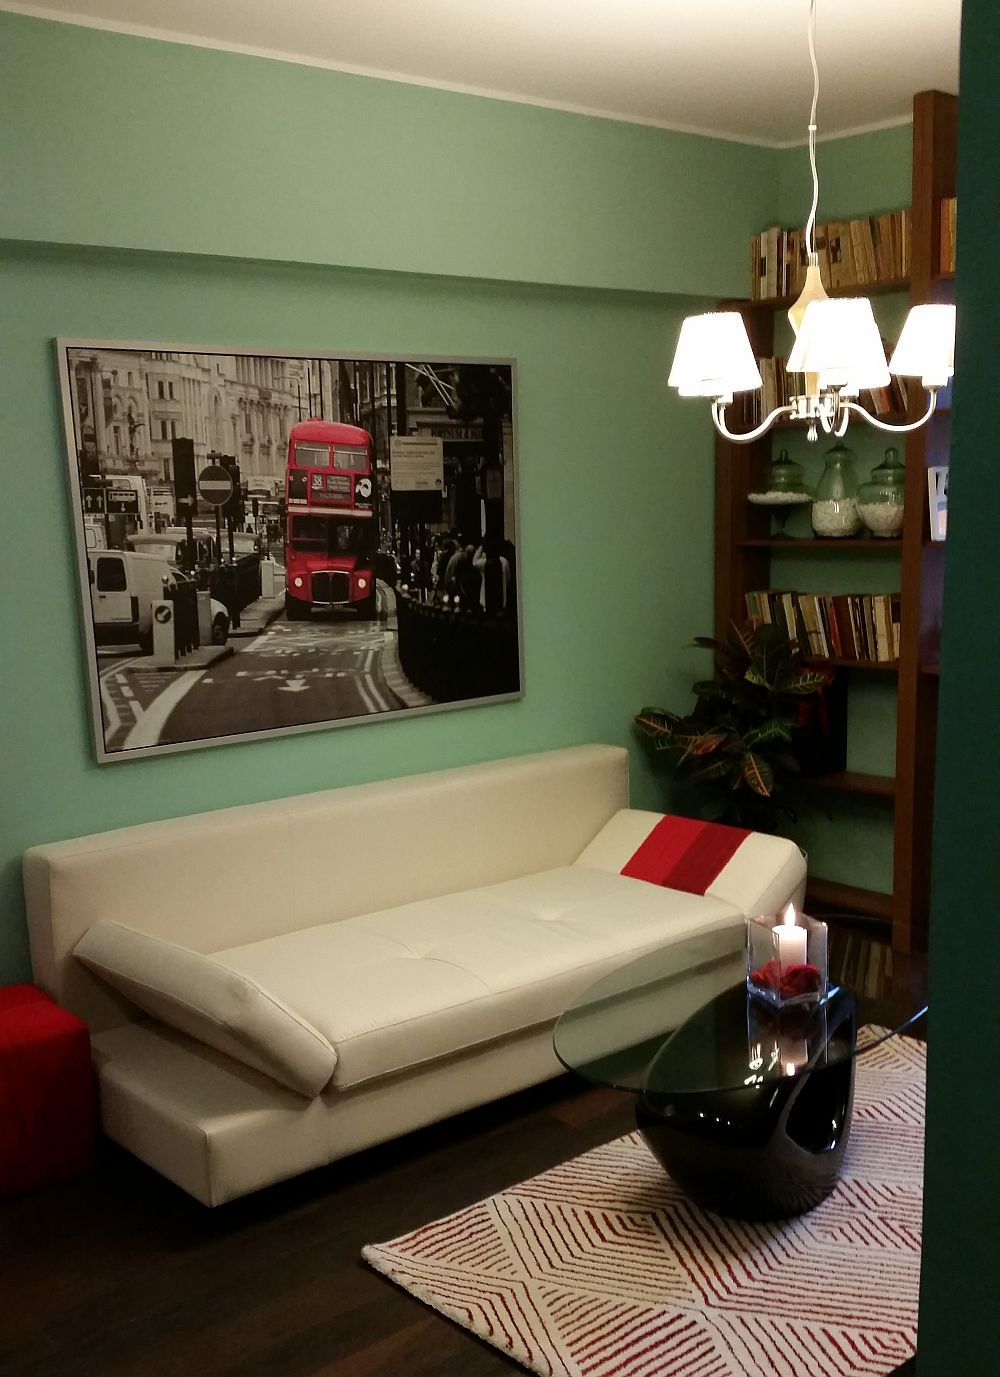 adelaparvu.com despre amenajare apartament Alice Muller din emisiunea Visuri la cheie de la ProTV, sezonul I, 2014 (3)